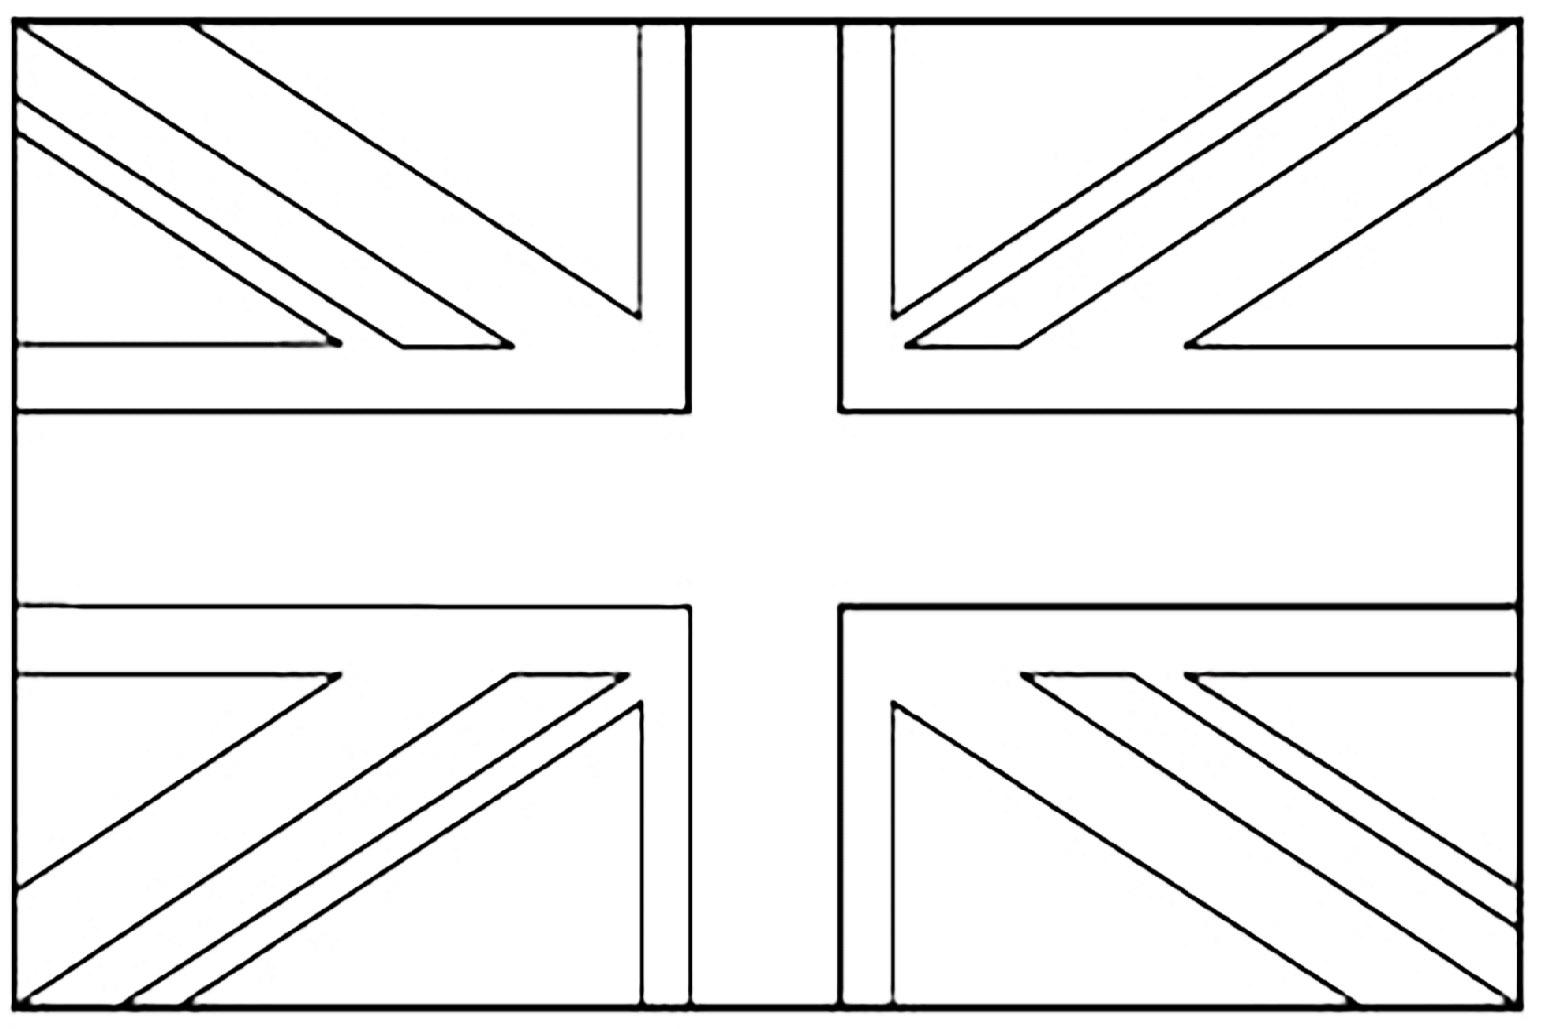 Excelente Bandera De Reino Unido Para Colorear Motivo - Dibujos Para ...